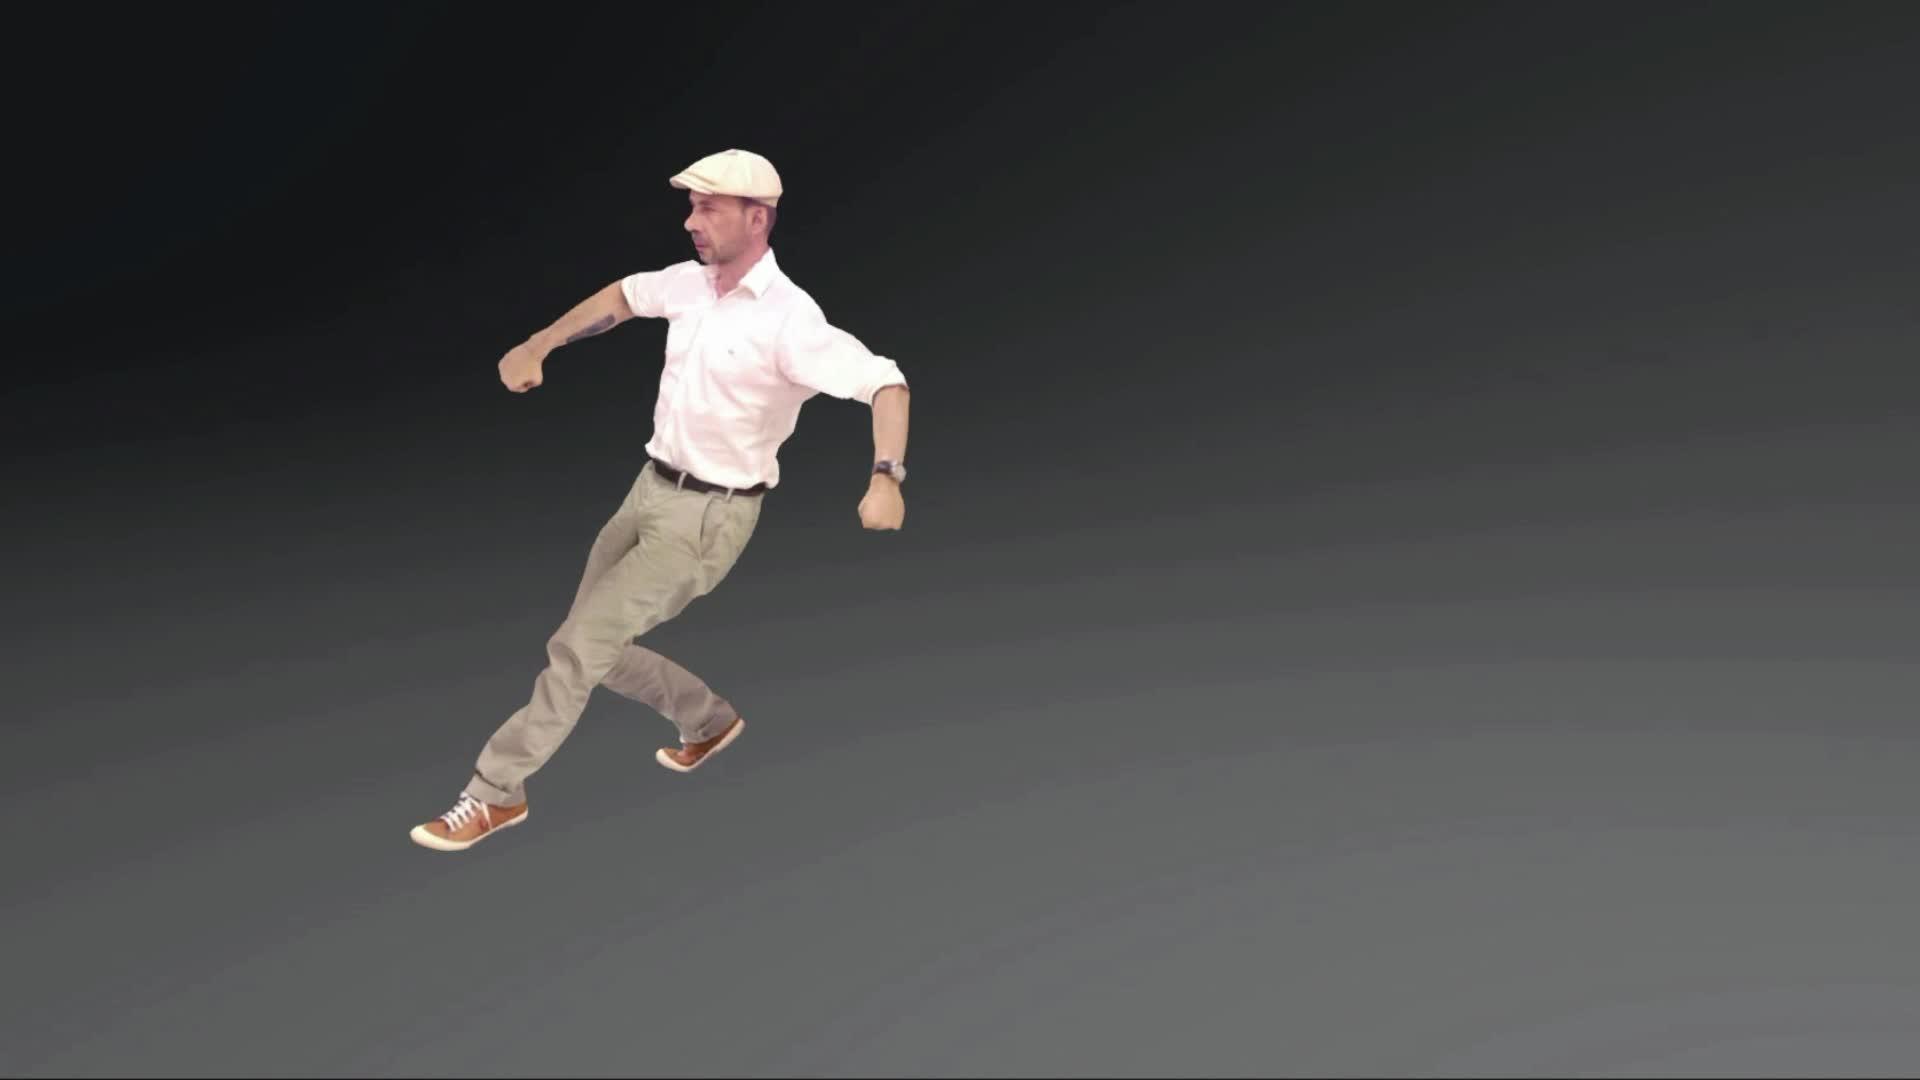 3D-scanner สำหรับ big วัตถุหรือมนุษย์ body Portal MX